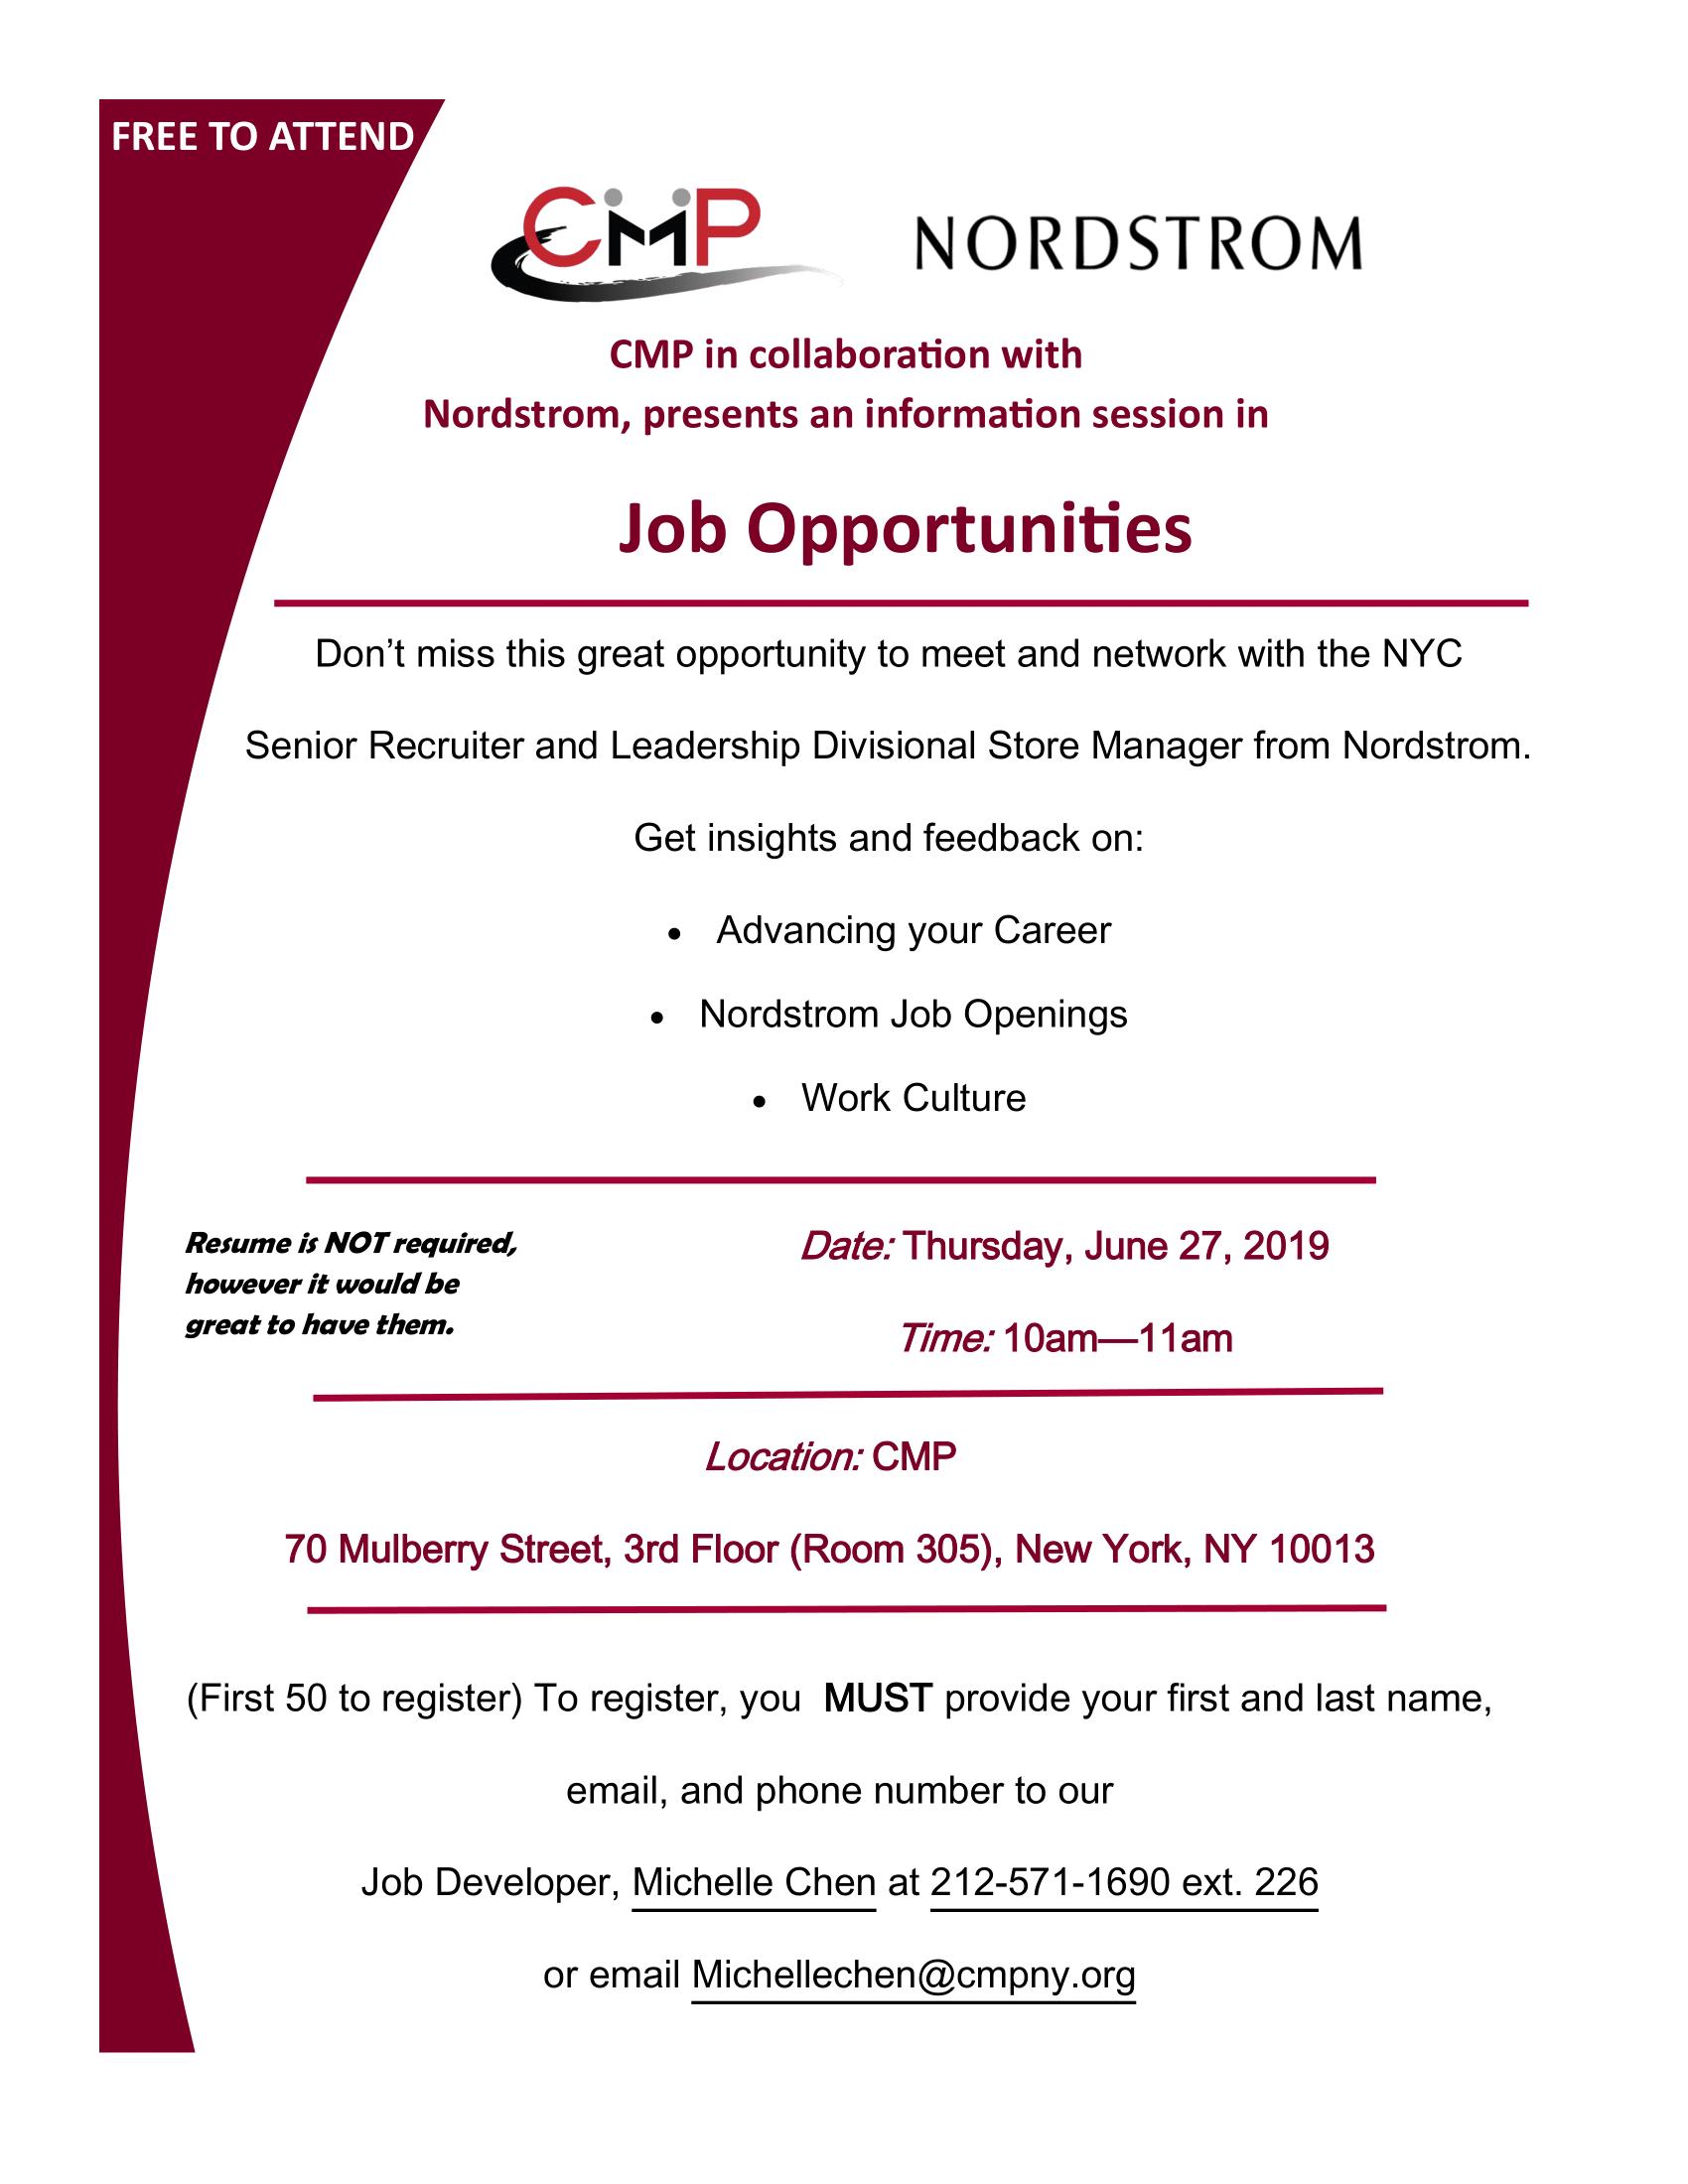 Nordstrom Pre-Career Fair Workshop Flyer June 2019-1.png